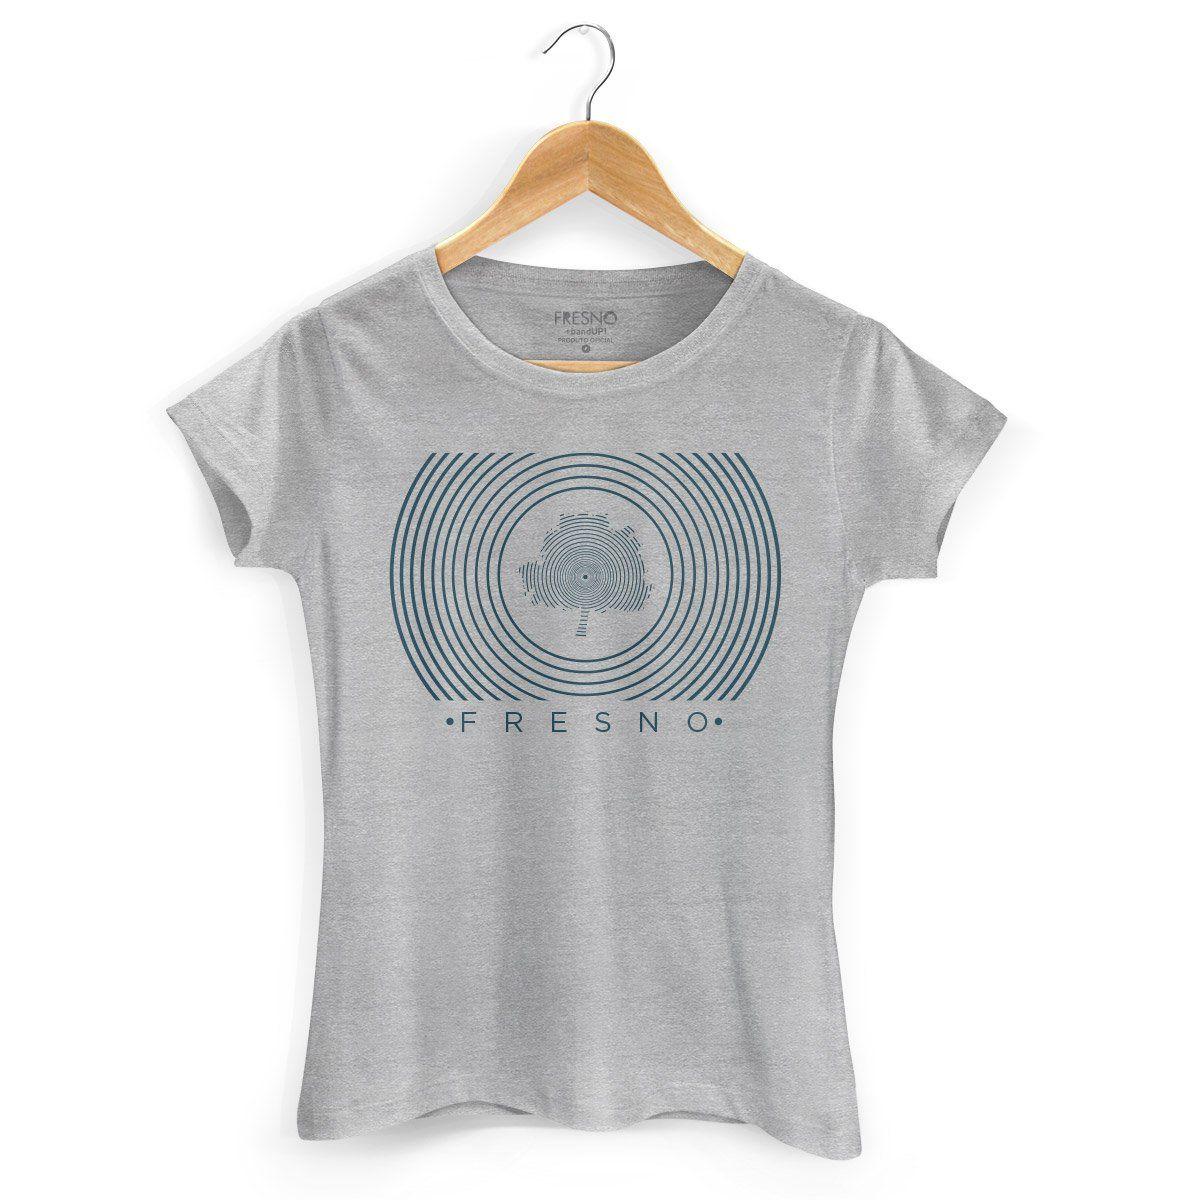 Camiseta Feminina Fresno Círculos